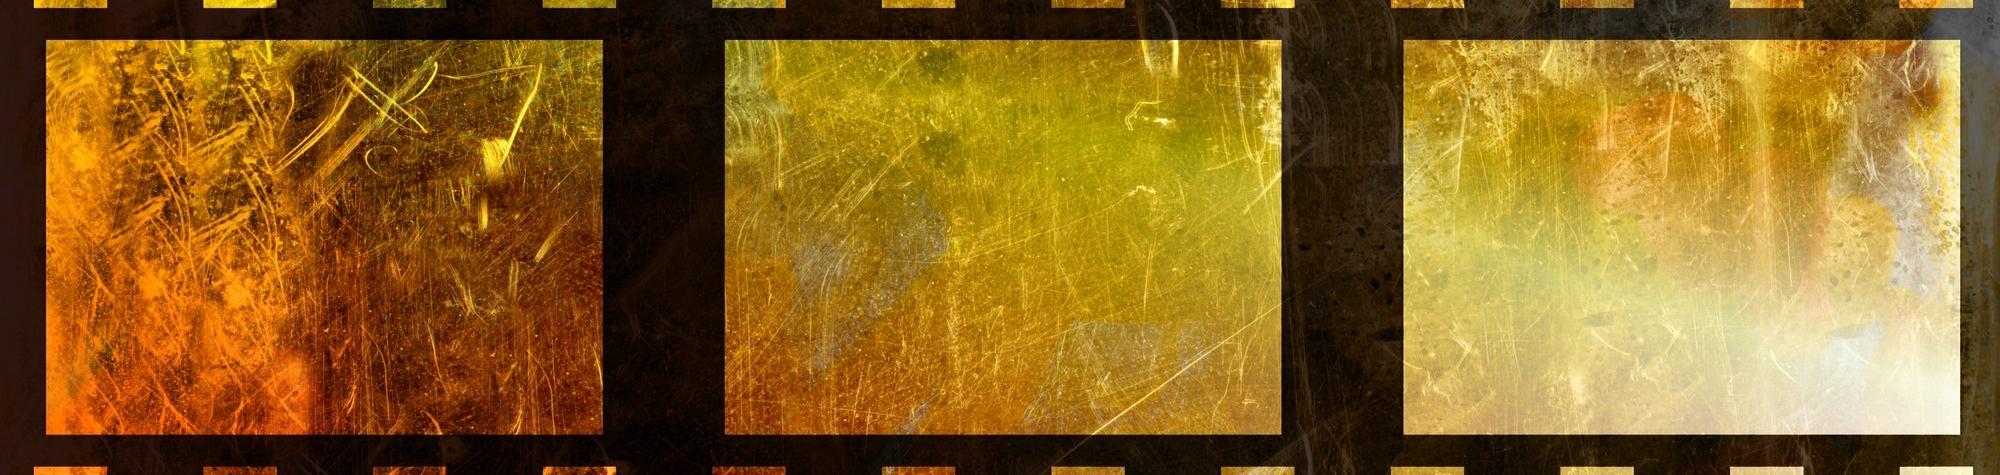 Film: Silence